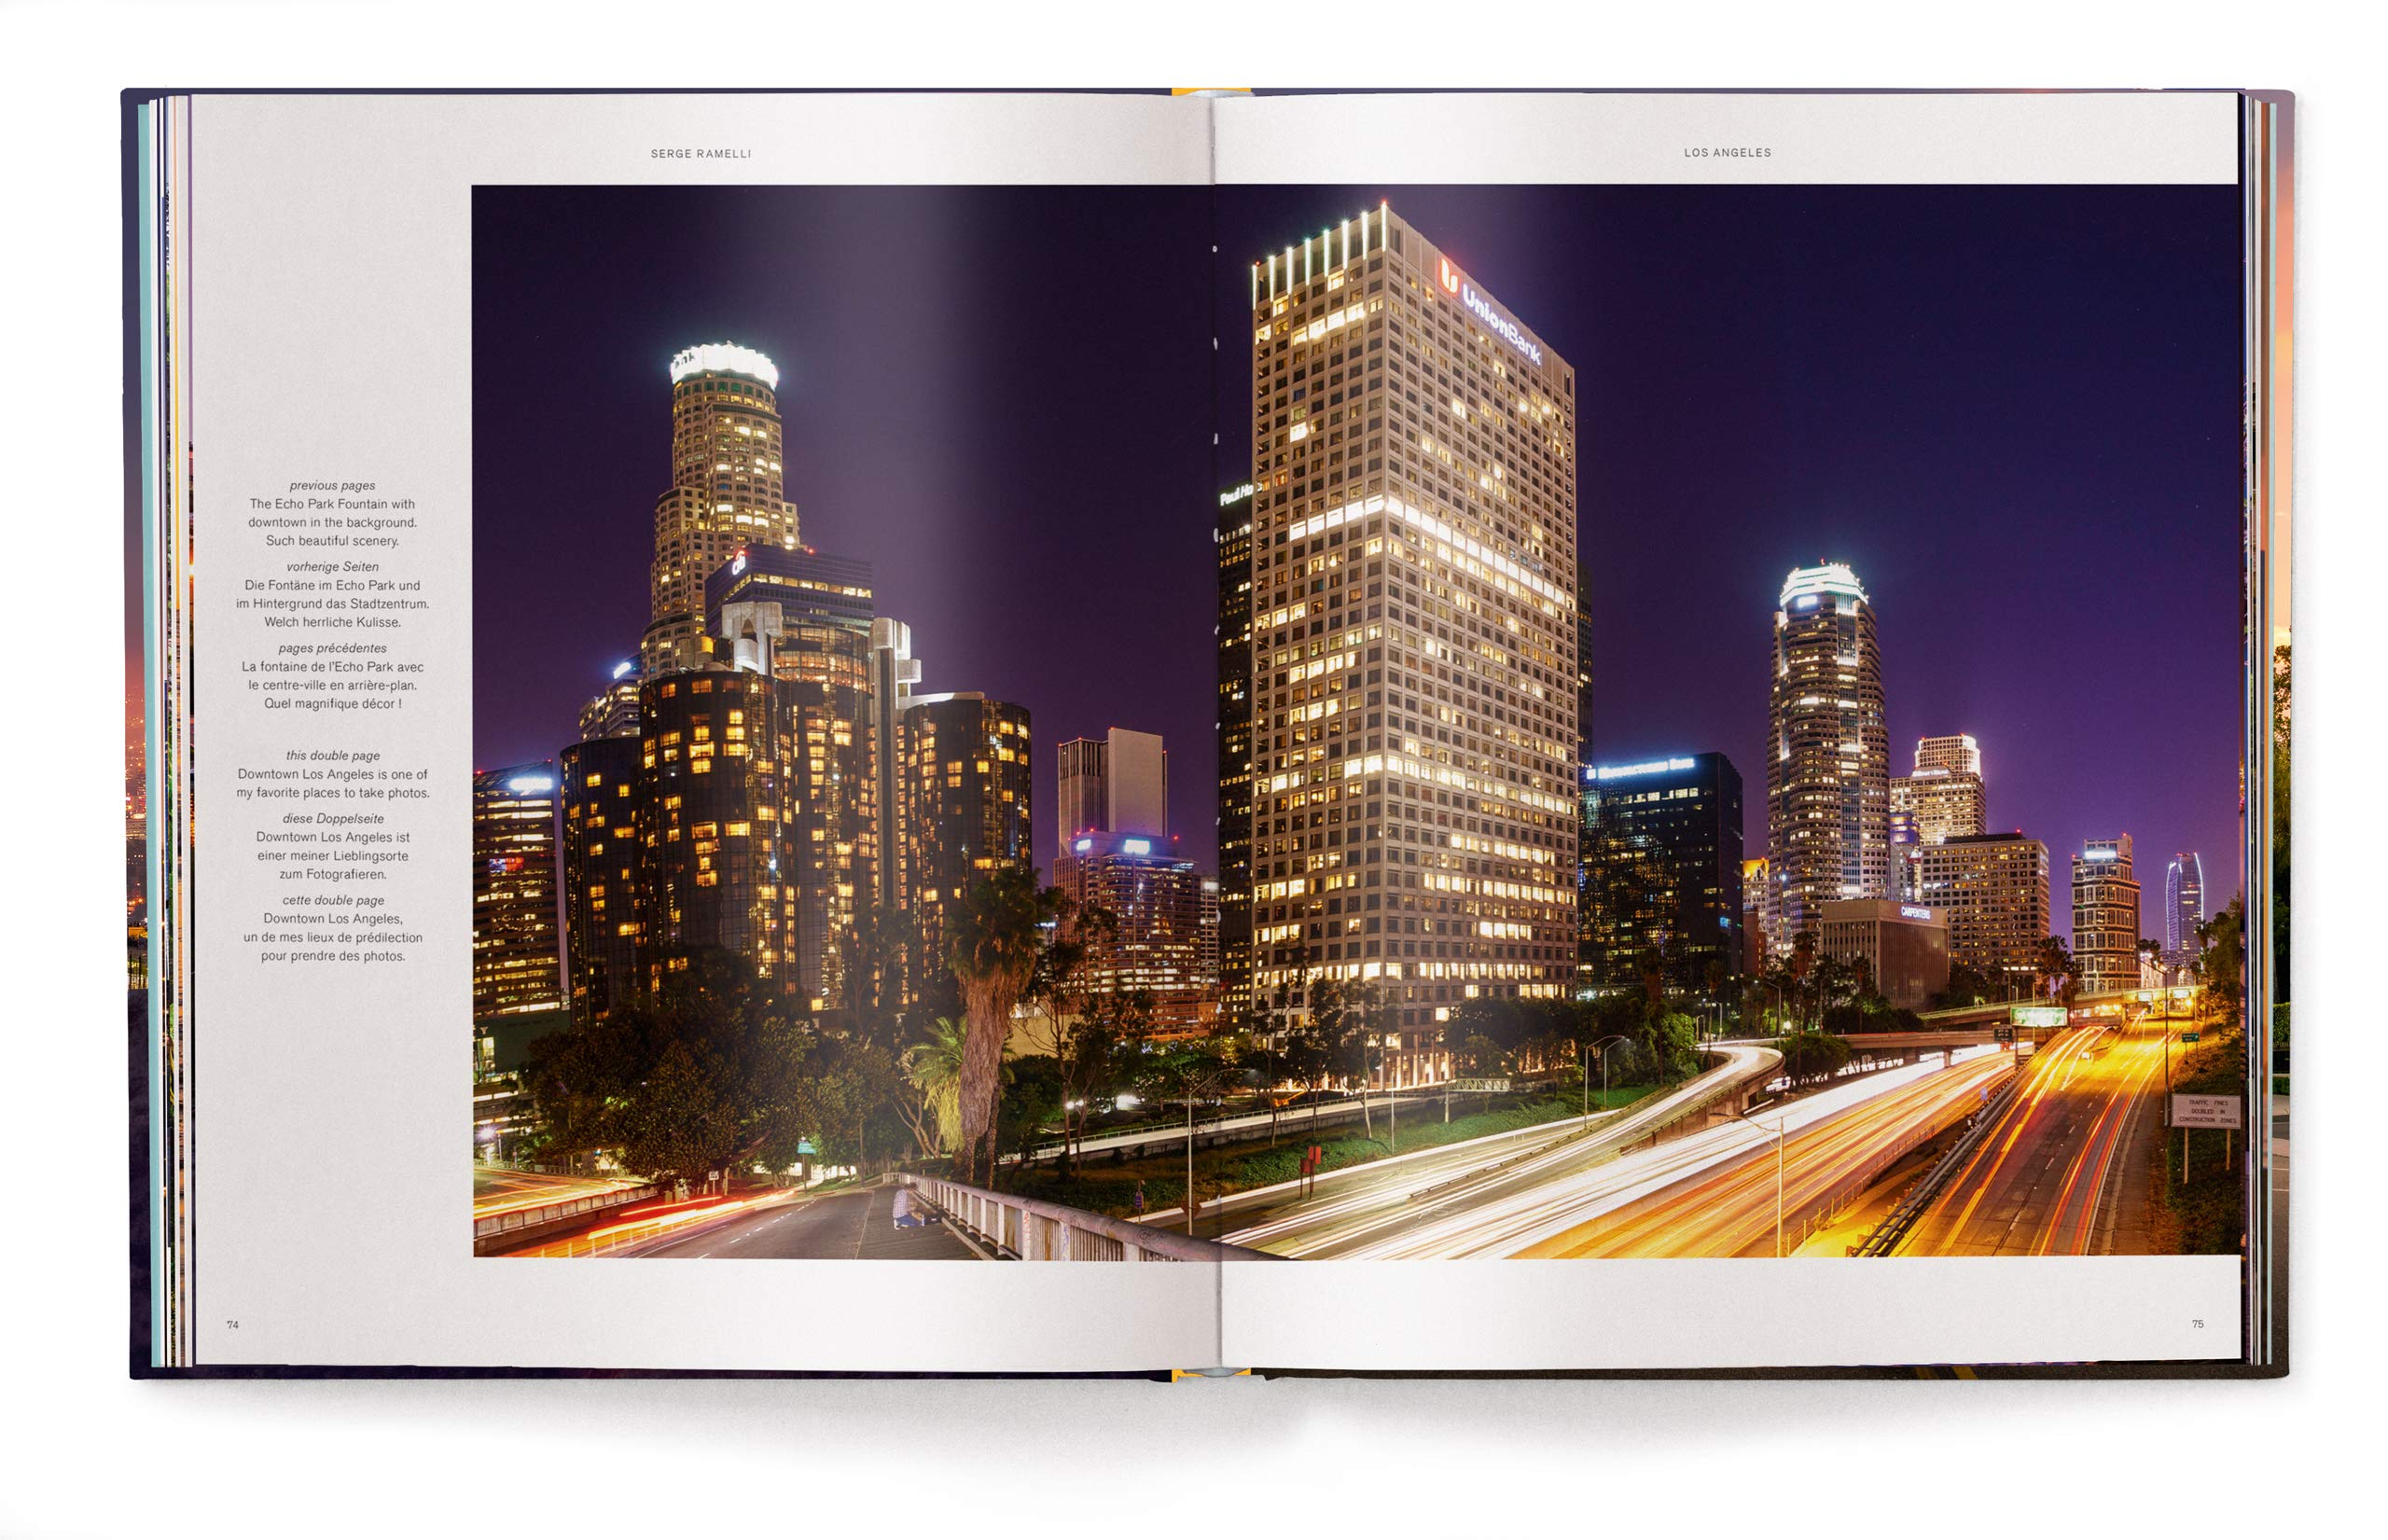 Los Ángeles (L.A.) - Página 2 81aHK5i-sAL